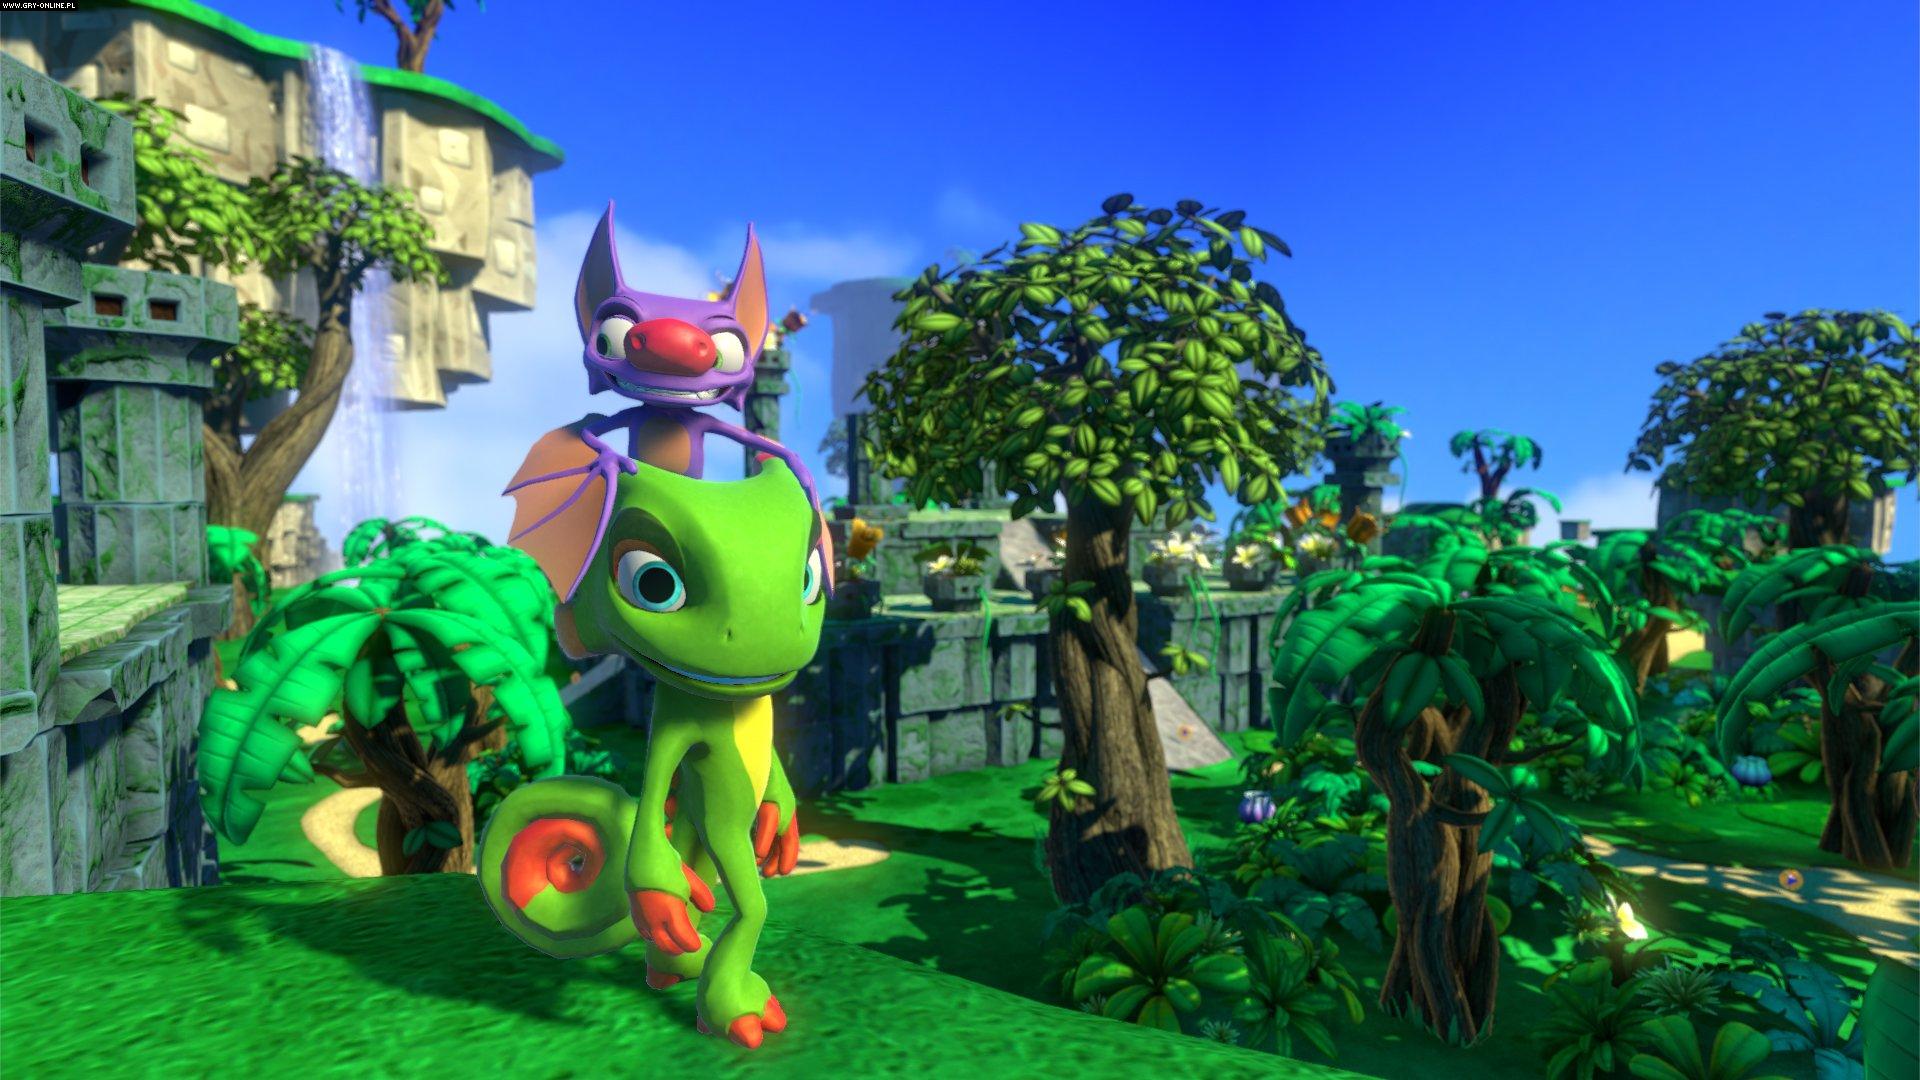 Yooka-Laylee PC, WiiU, XONE, PS4 Games Image 15/30, Playtonic Games, Team 17